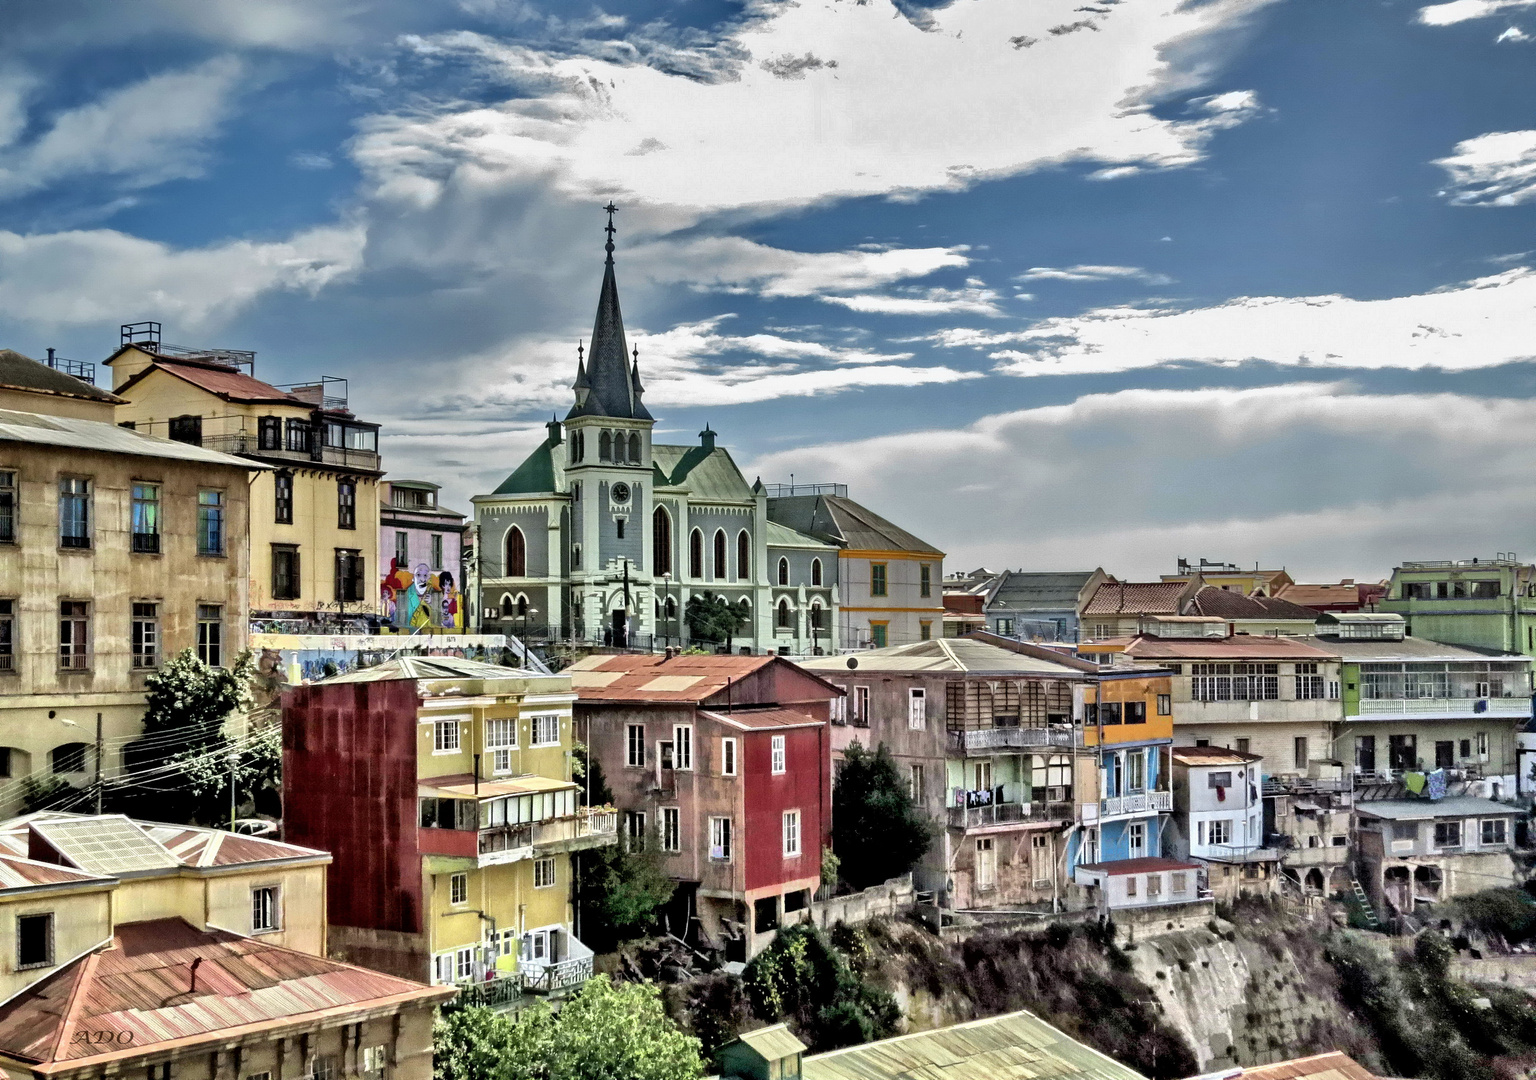 Valparaiso - in my eyes